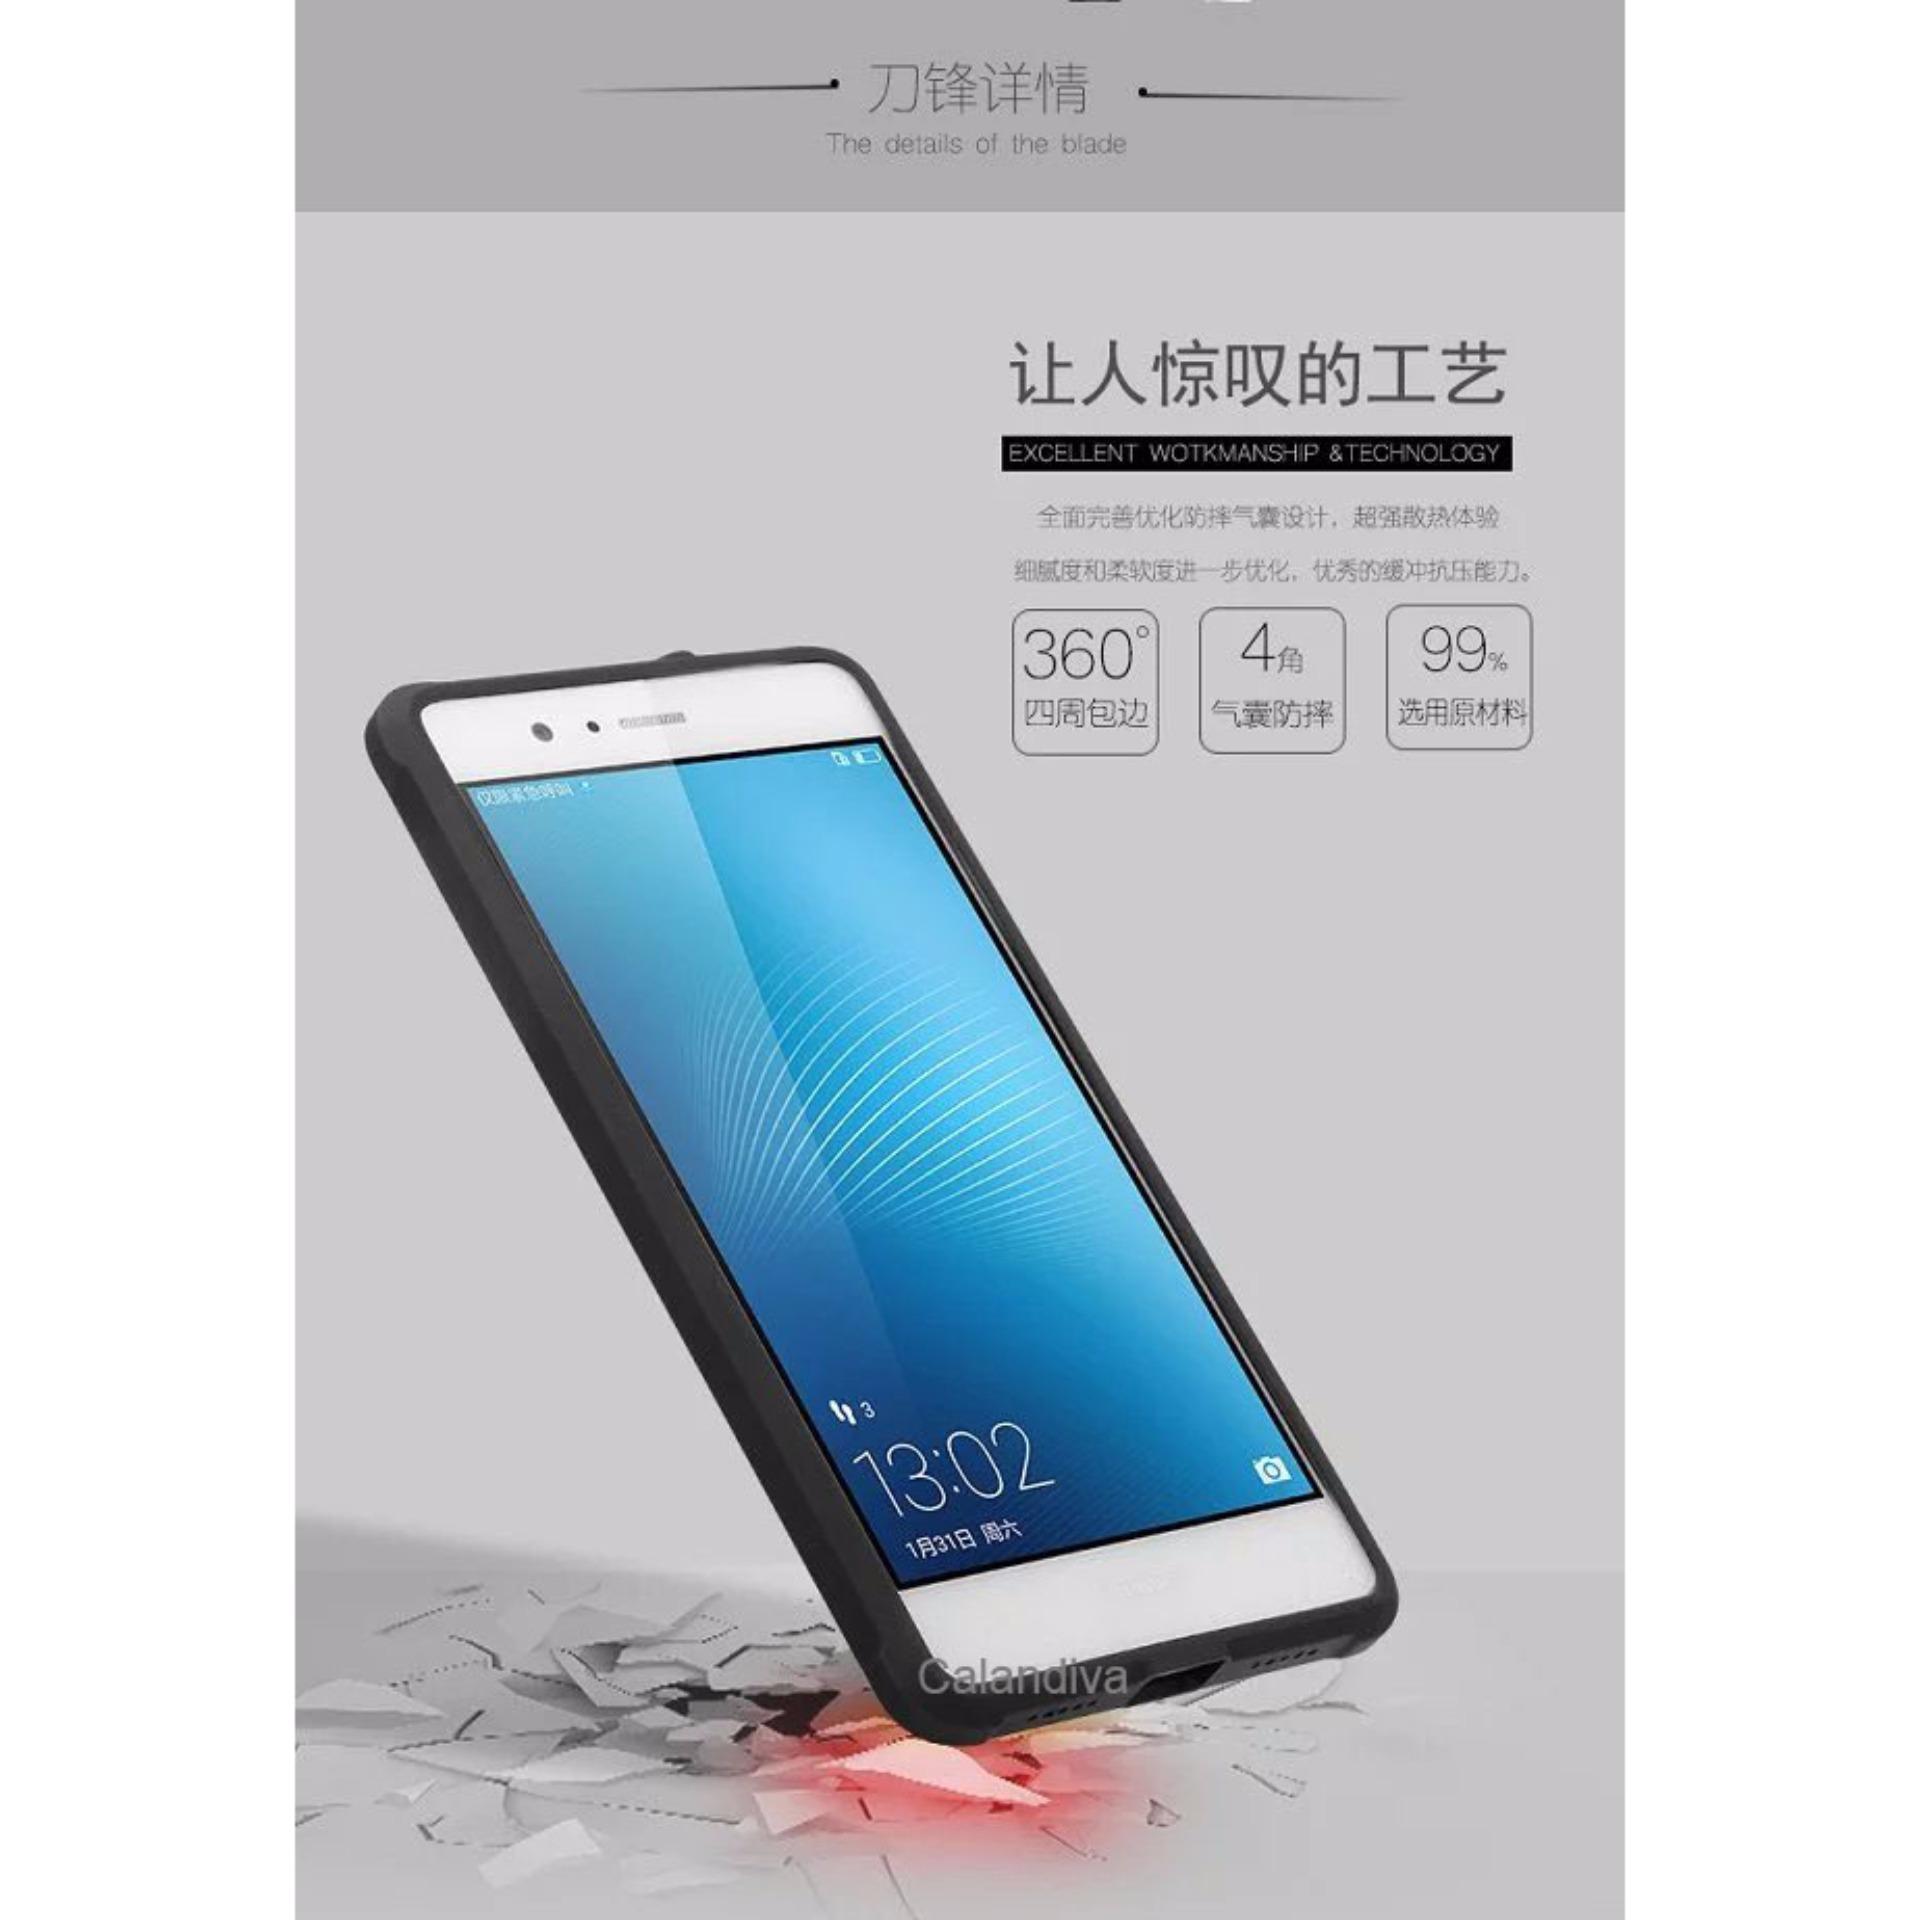 Calandiva Shockproof Hybrid Case for Huawei P9 Lite G9 Lite Hitam Rounded Tempered .